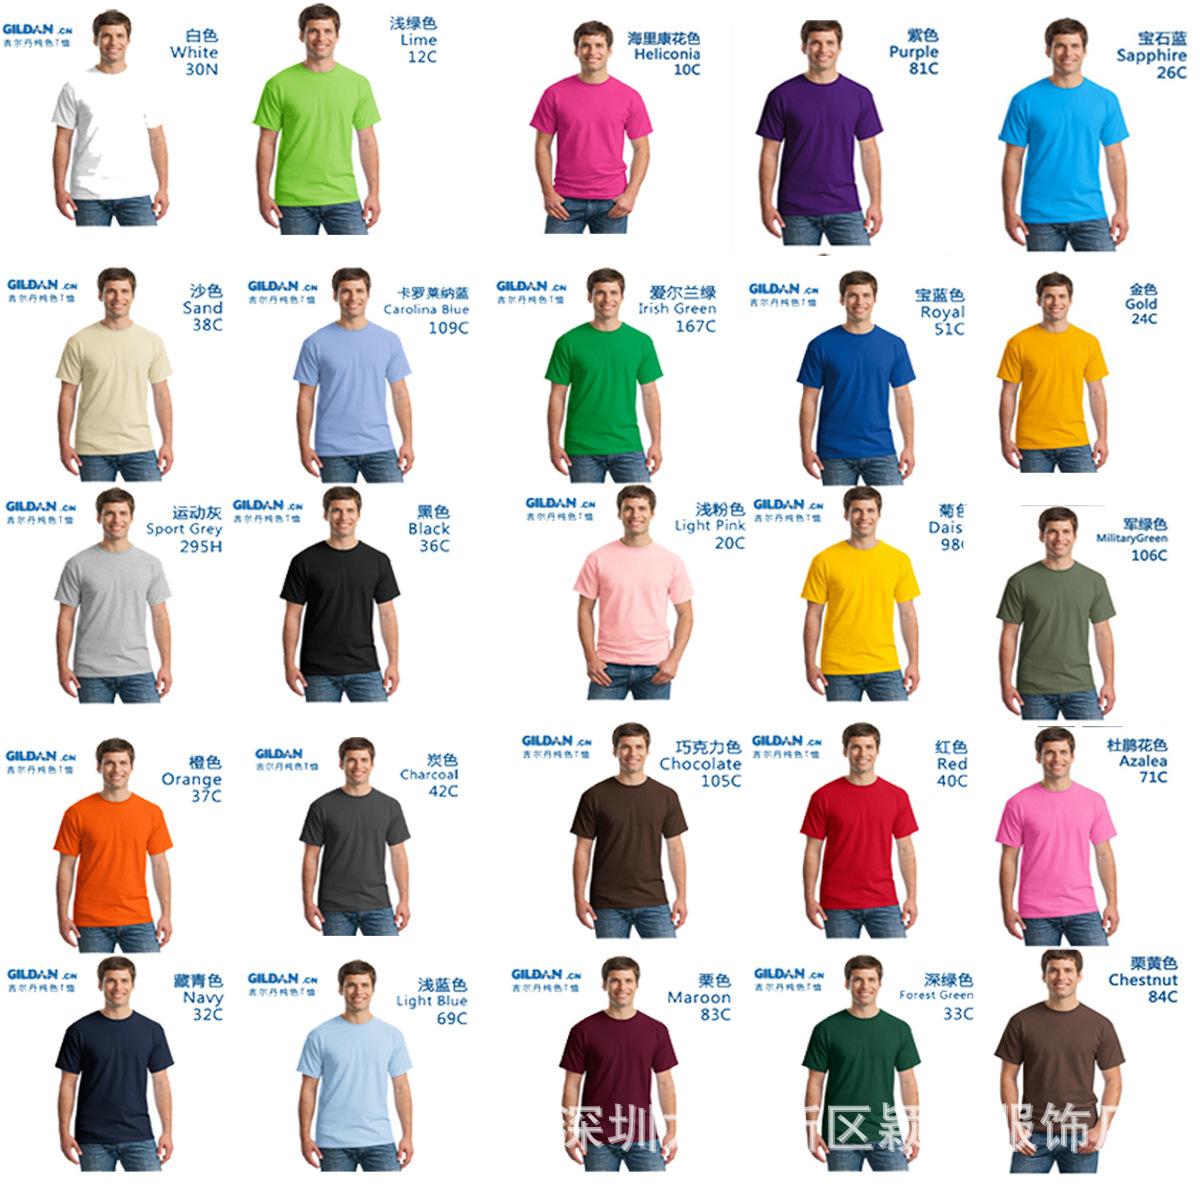 GILDAN吉爾丹76000男款進口圓領廣告文化T恤衫印花潮定制批發定制